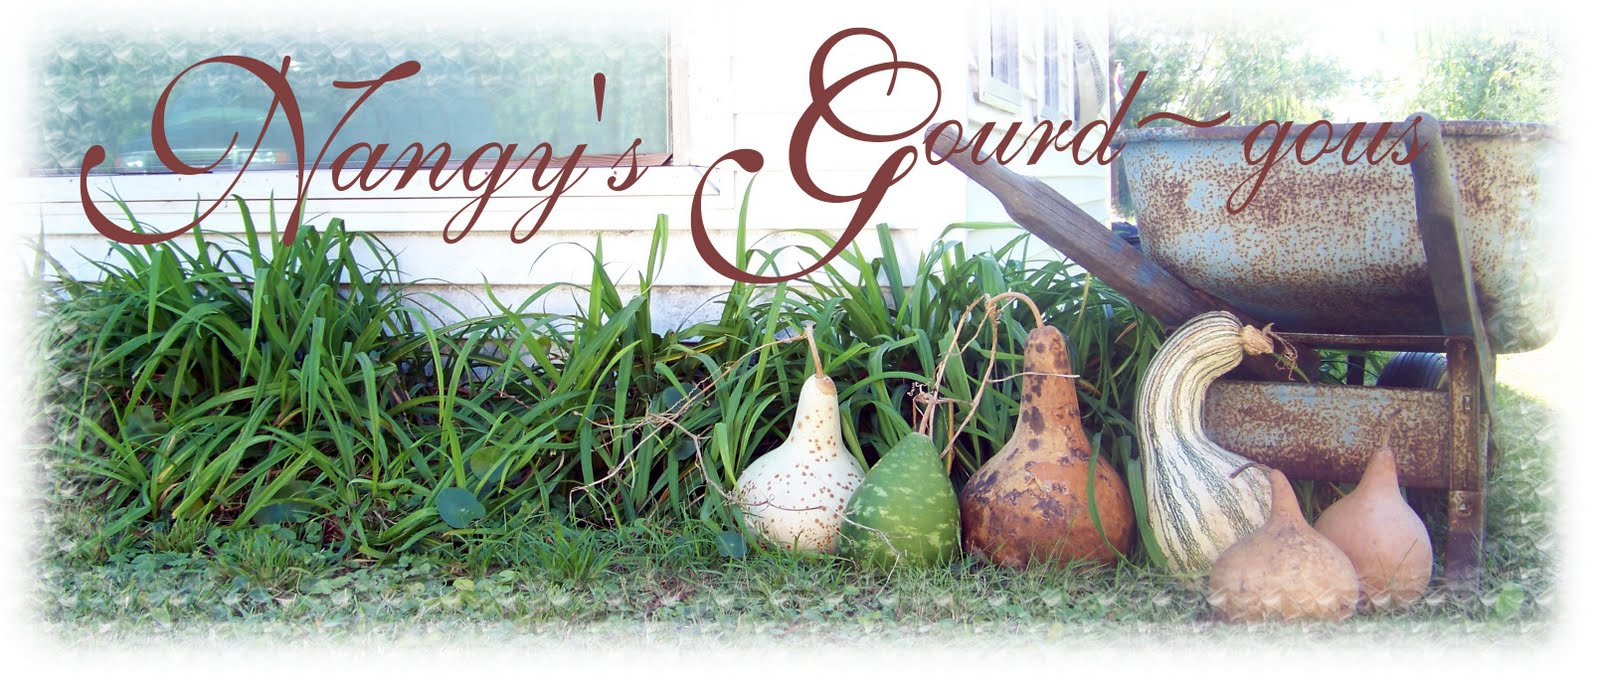 Nangy's Gourd~gous